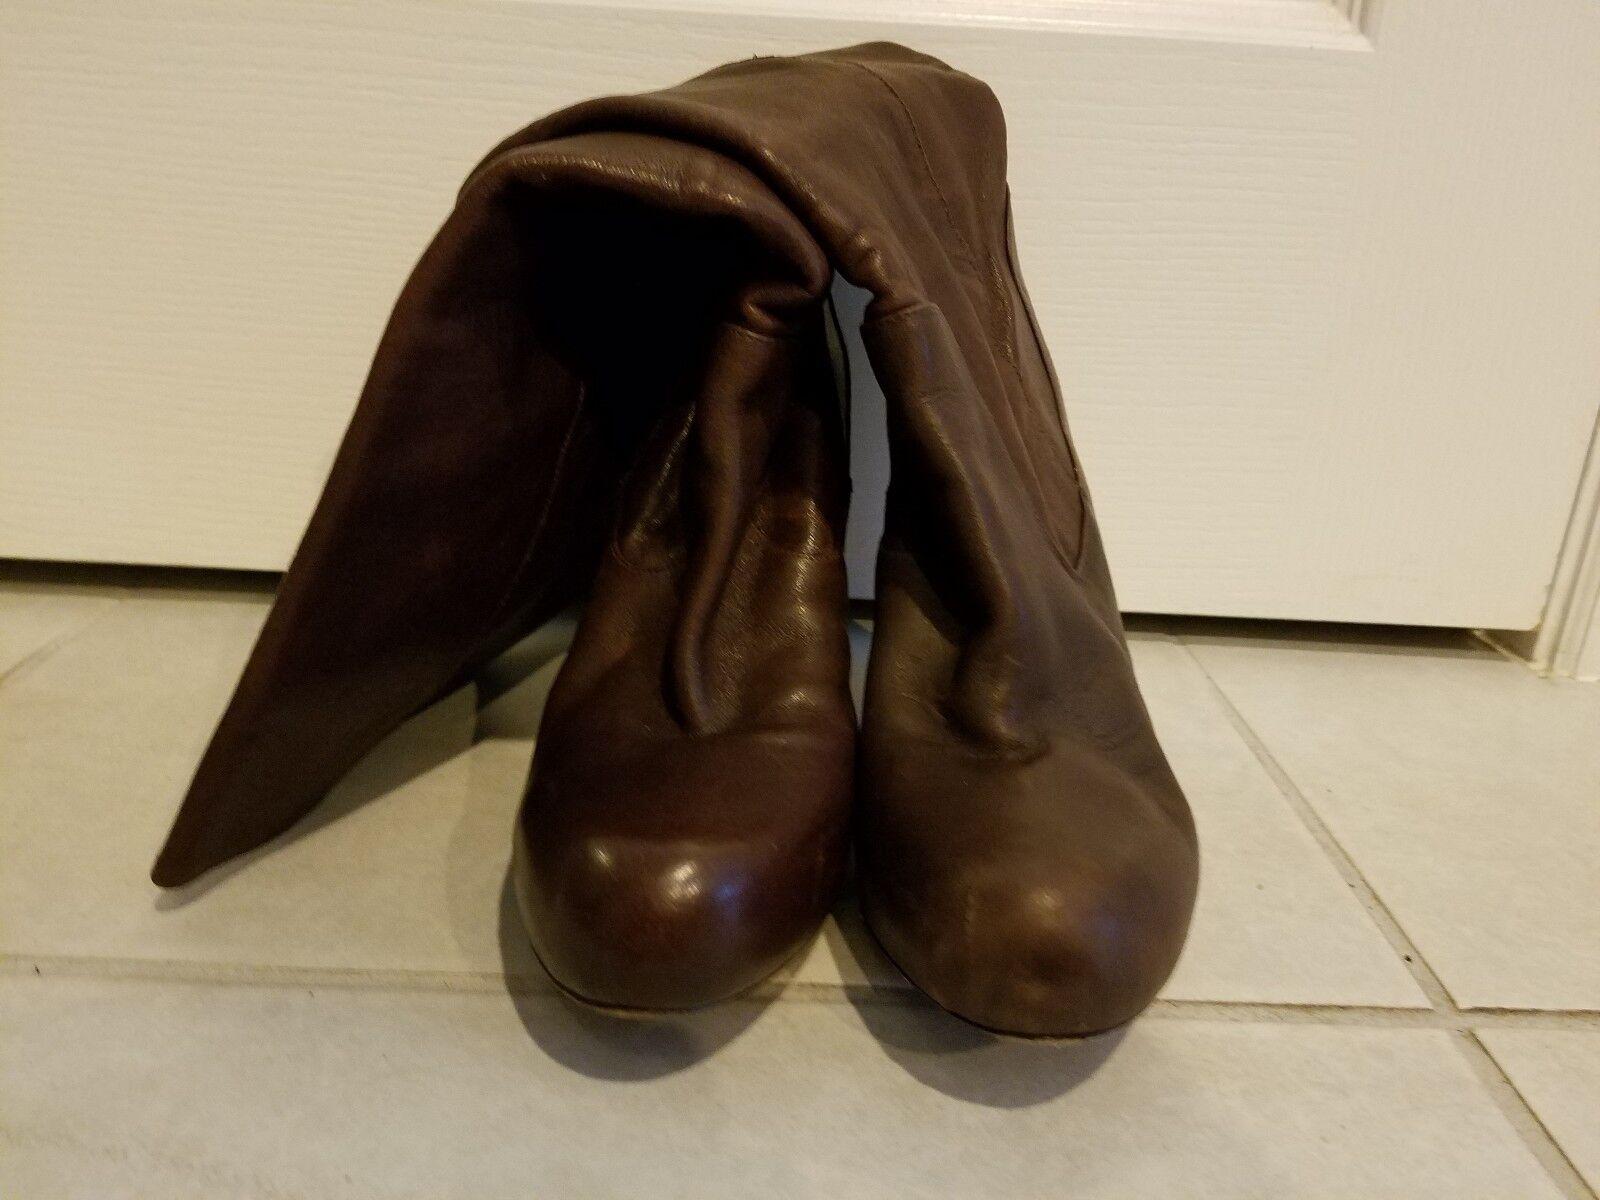 Loeffler Randal Women's Boots 9.5 B  Brown Leather Knee High